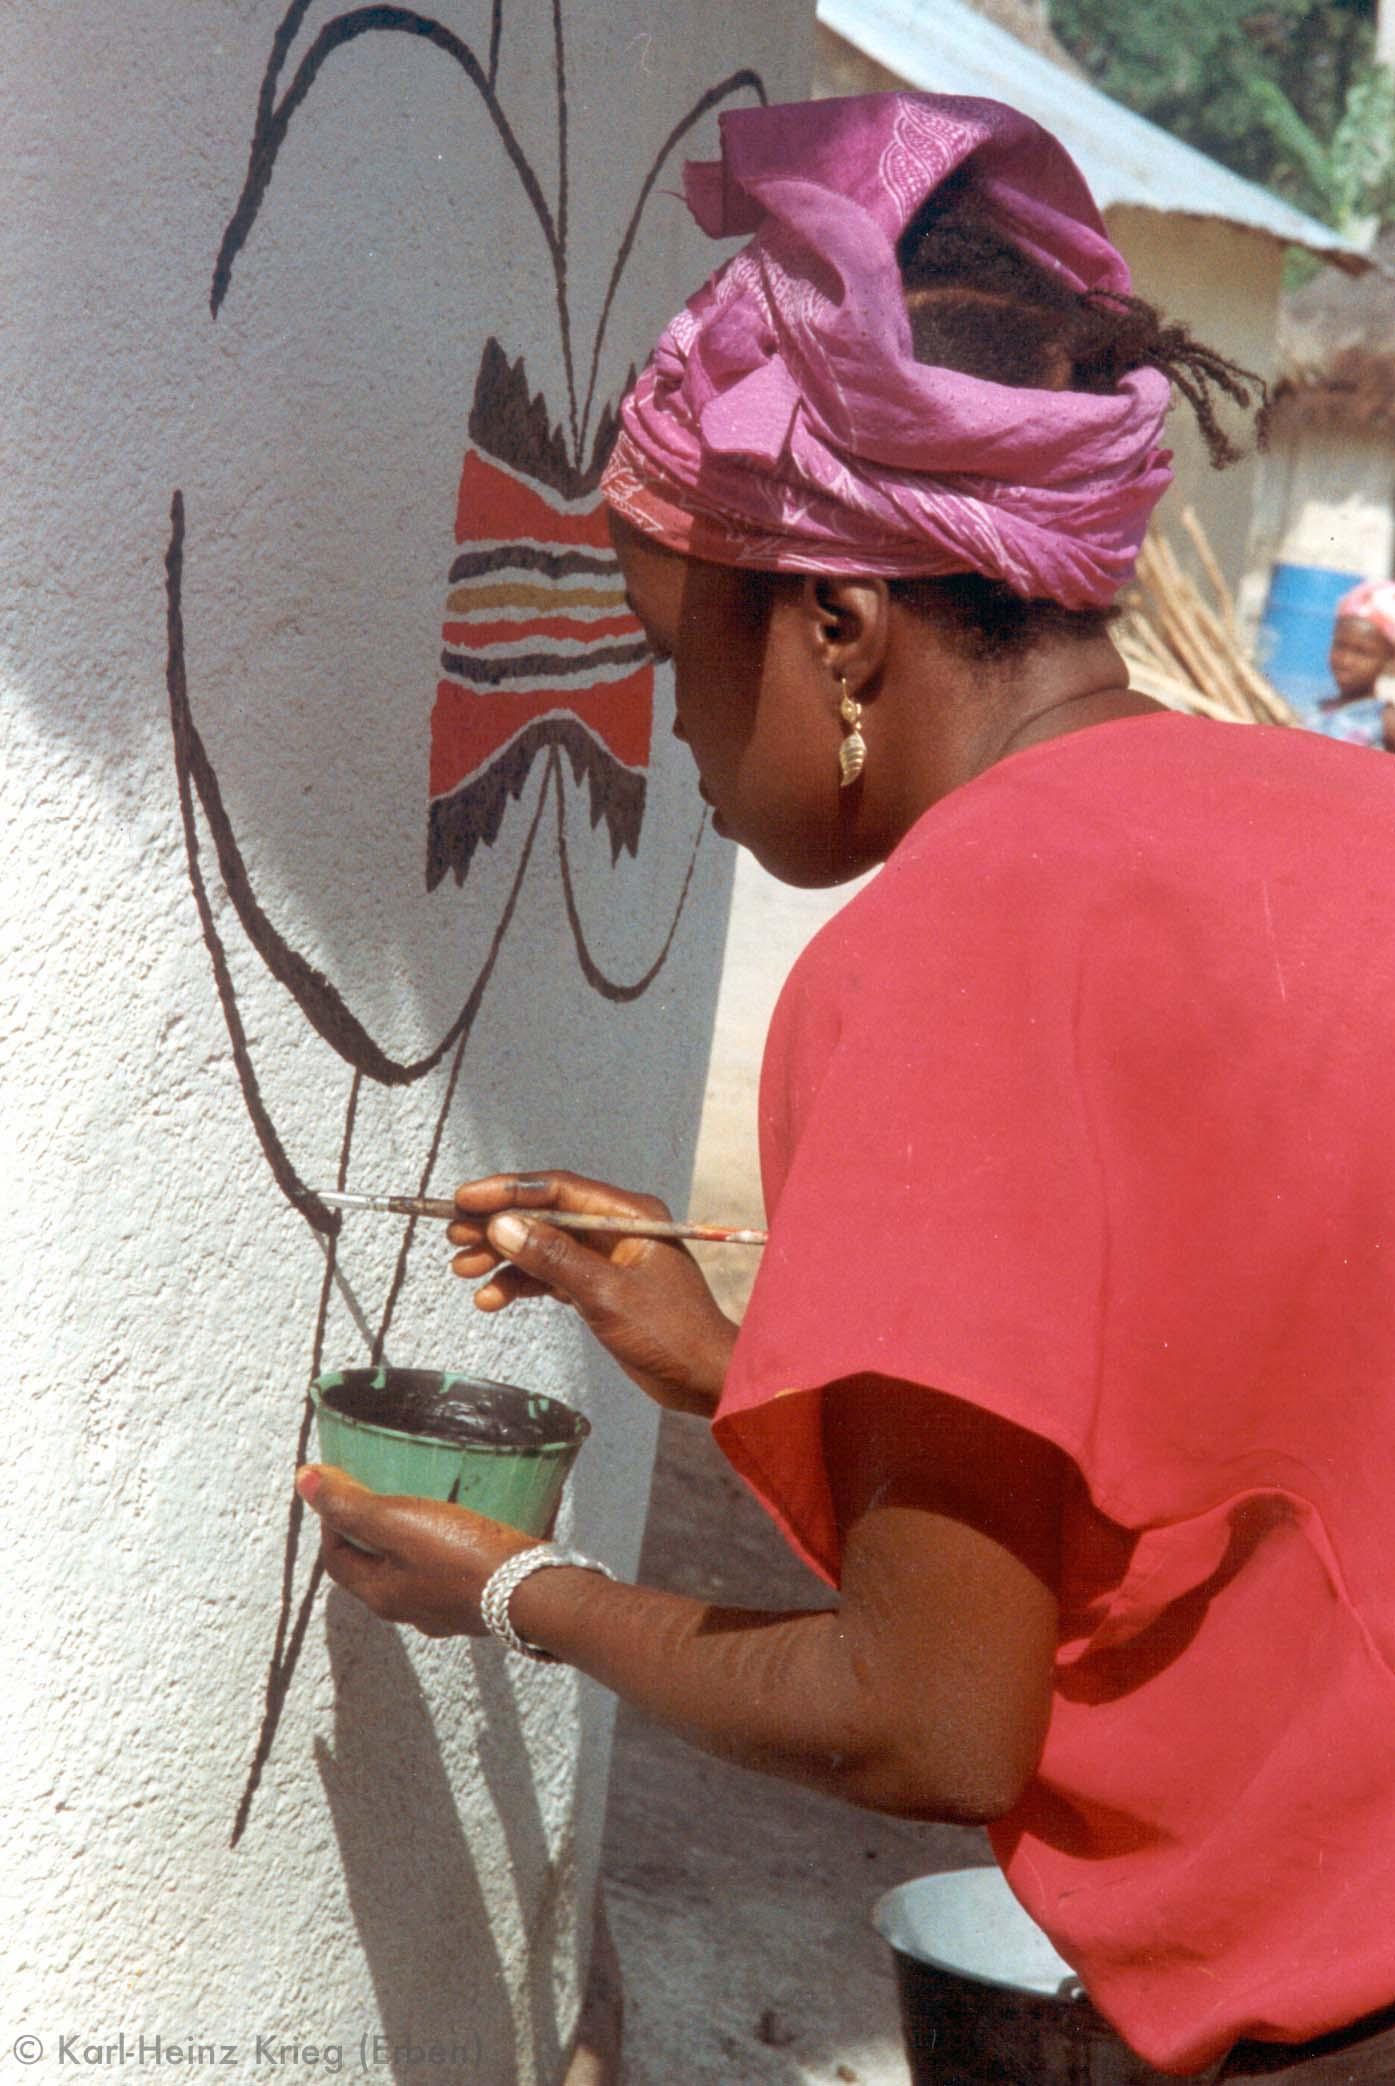 Kolouma Sovogi bemalt ein Haus. Foto: Karl-Heinz Krieg, Segbémé (Guinea), 1996